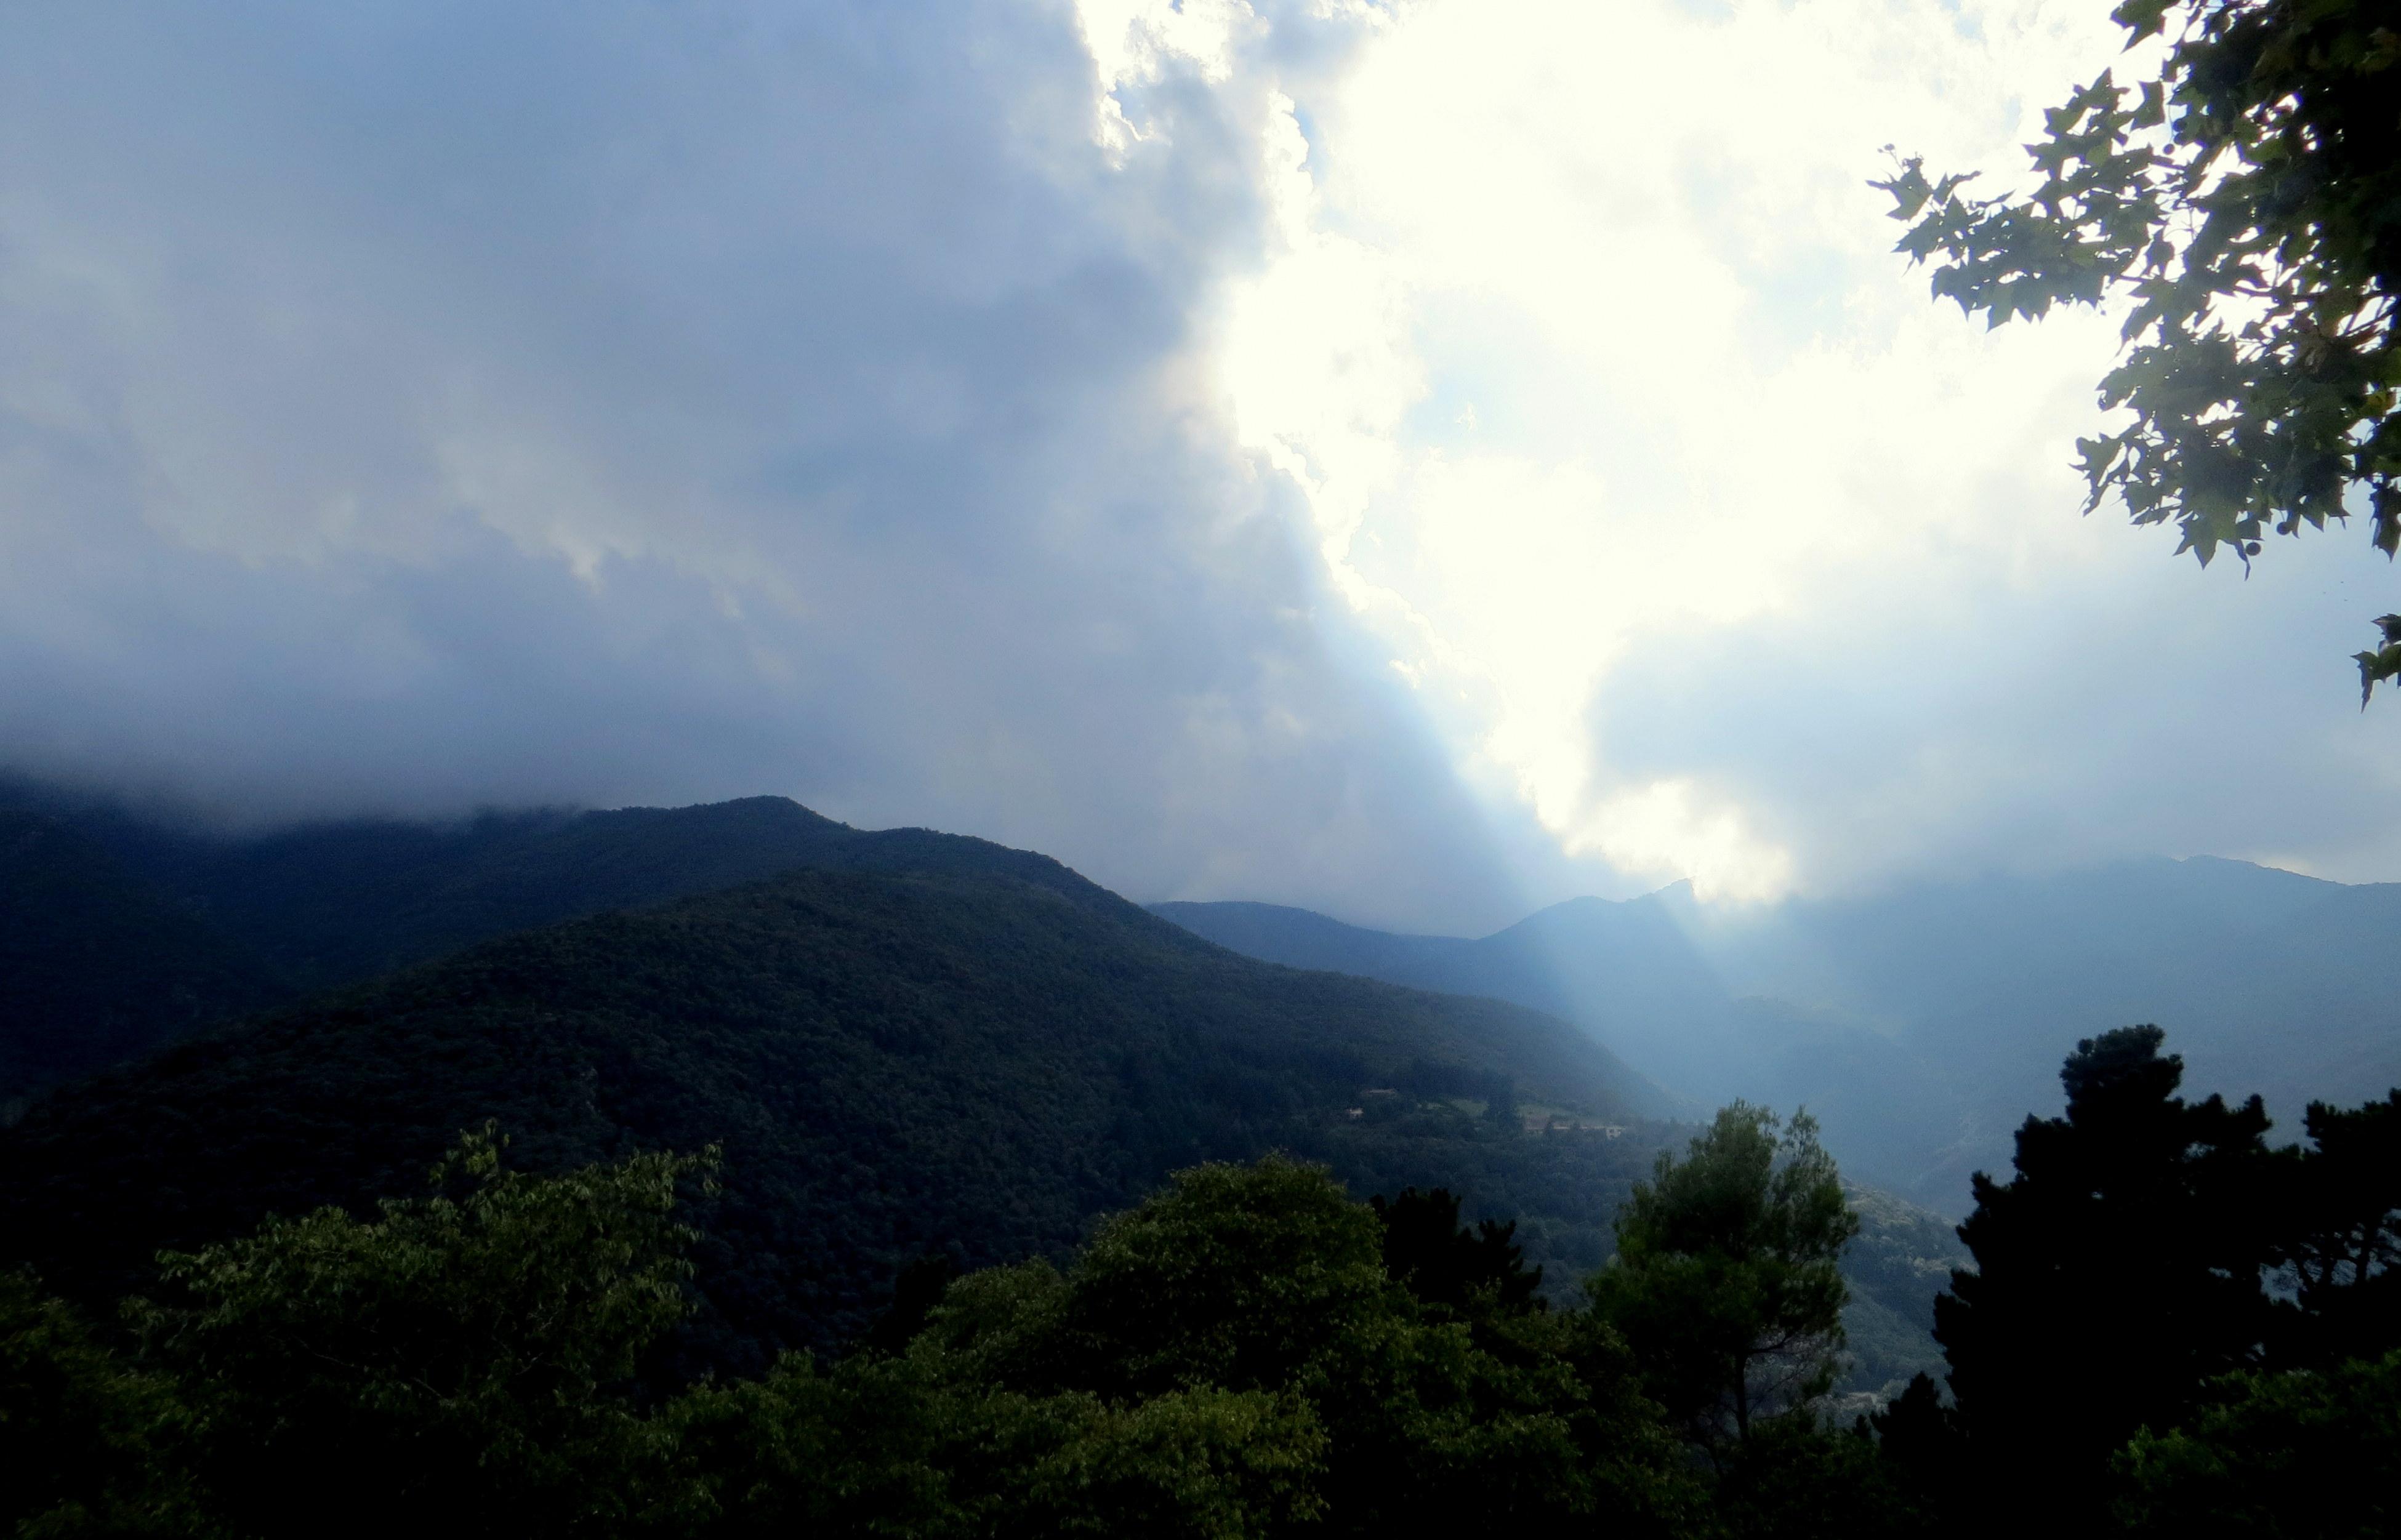 Simple Wallpaper Mountain Rain - sky-before-rain-sun-rays-mountains-green-clouds-landscape-nature-peace-calm-meditation-idyllic-sky-highland-cloud-mountainous-landforms-mountain-hill-station-mount-scenery-vegetation-tree-forest-atmosphere-hill-wilderness-ridge-mountain-range-morning-atmosphere-of-earth-sunlight-national-park-cumulus-phenomenon-mist-geological-phenomenon-valley-rainforest-jungle-meteorological-phenomenon-biome-rural-area-evening-plateau-horizon-dawn-computer-wallpaper-1426285  Gallery_18248.jpg